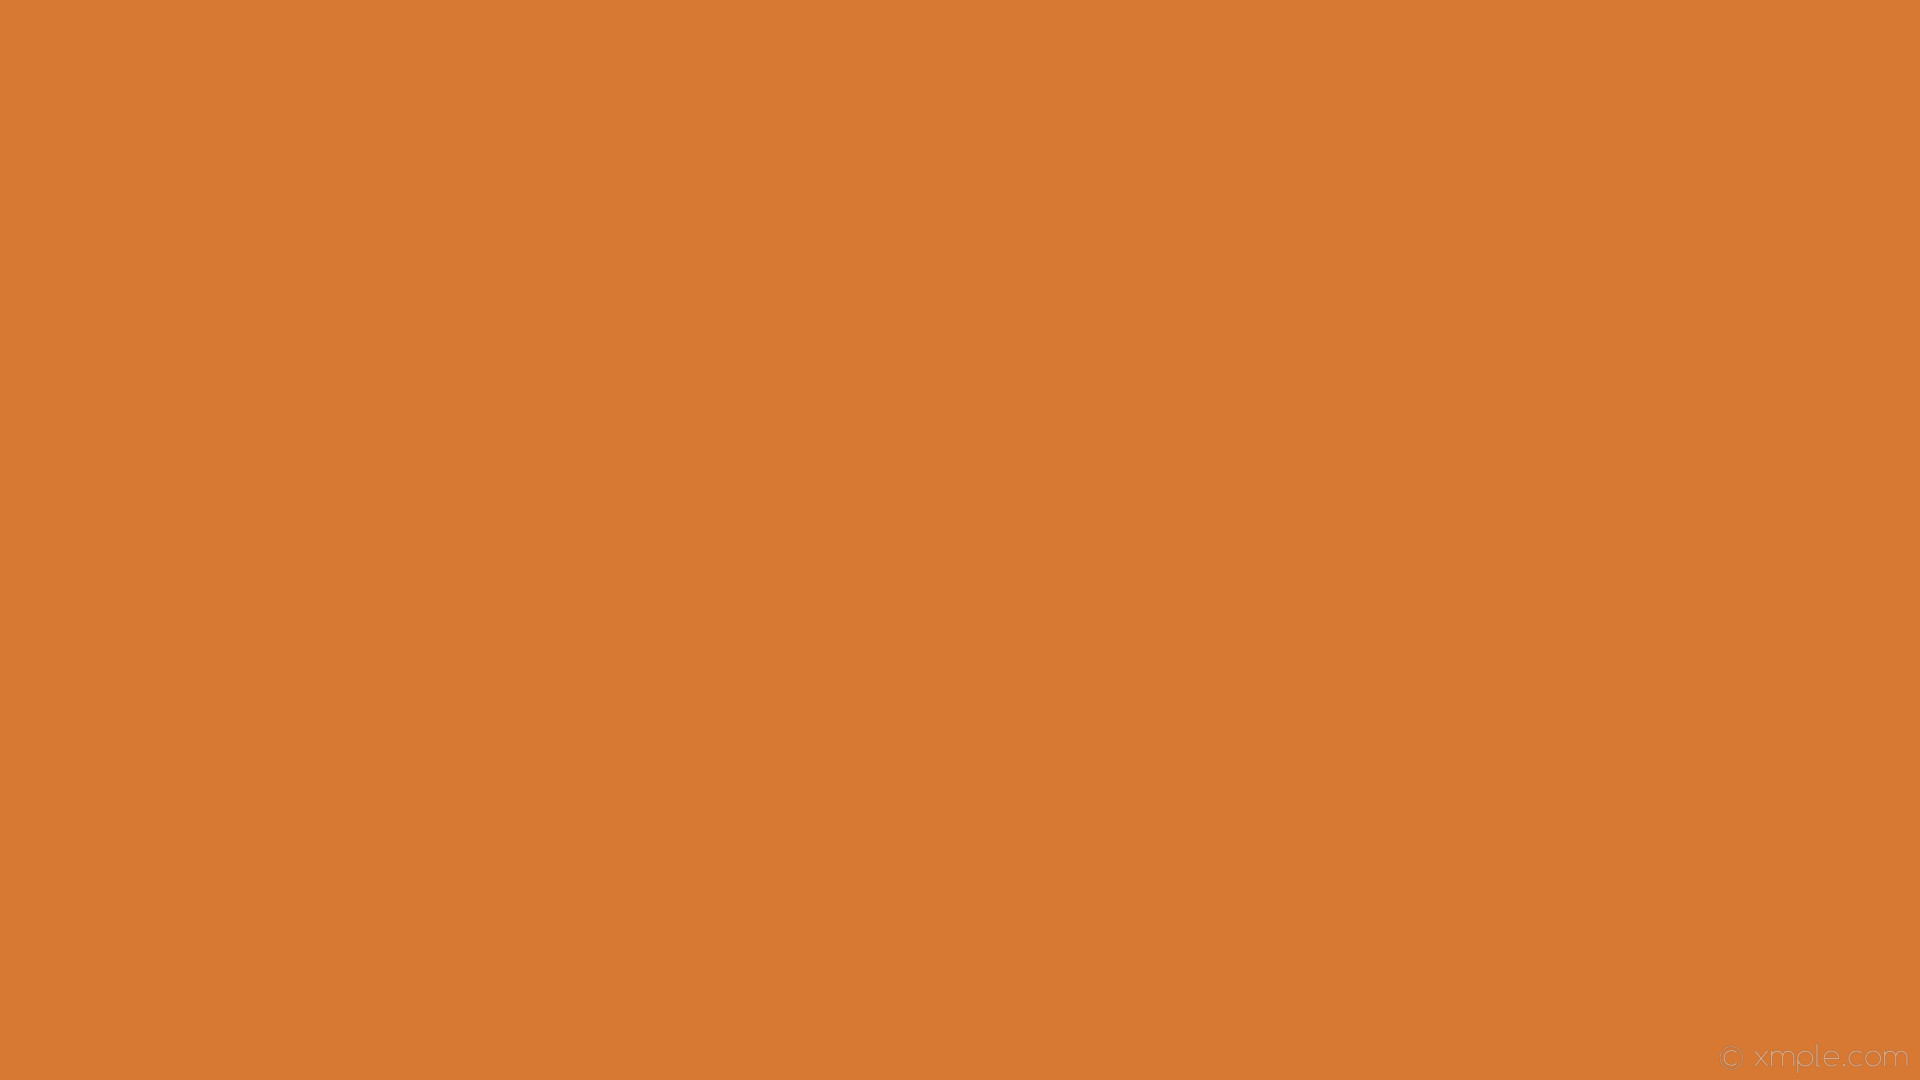 wallpaper orange color 61 images